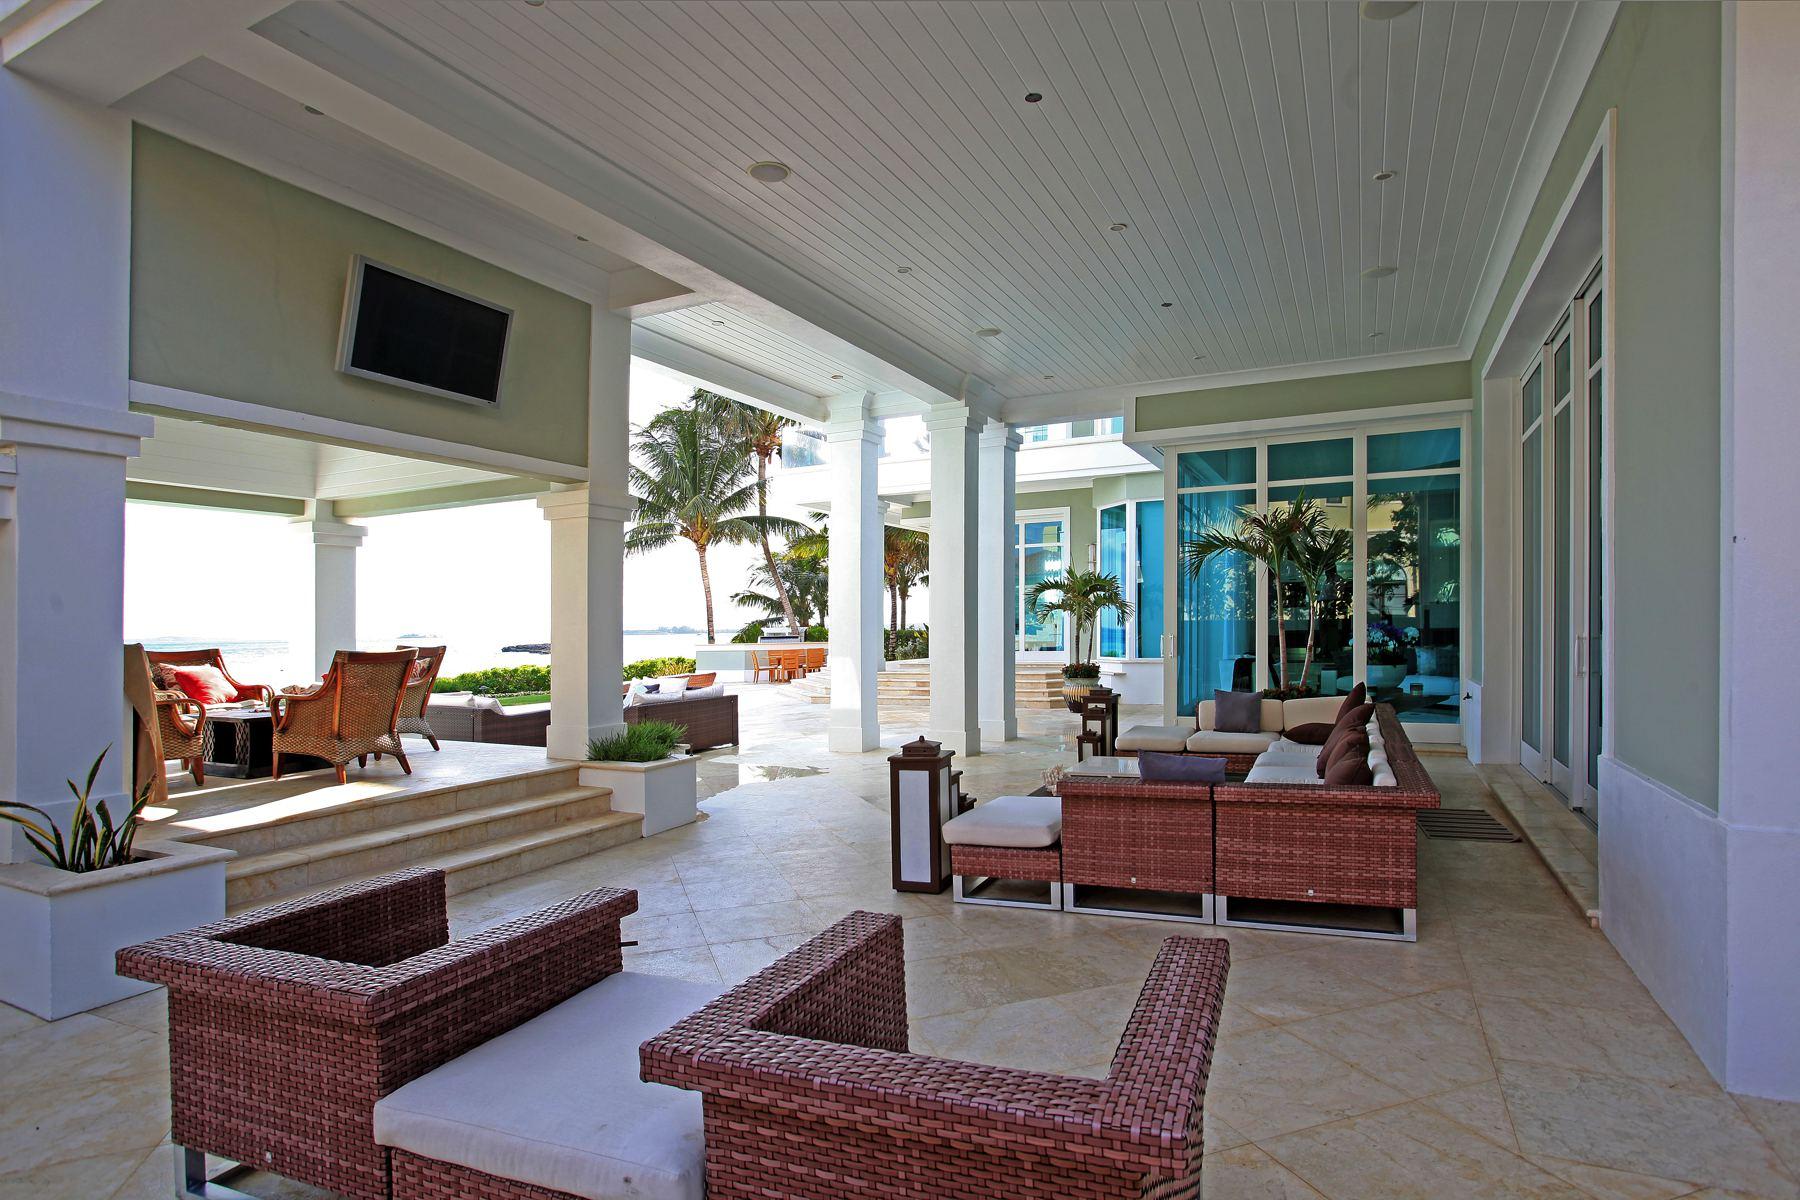 Additional photo for property listing at 38 Ocean Club Estates Ocean Club Estates, Paradise Island, Nassau And Paradise Island Bahamas